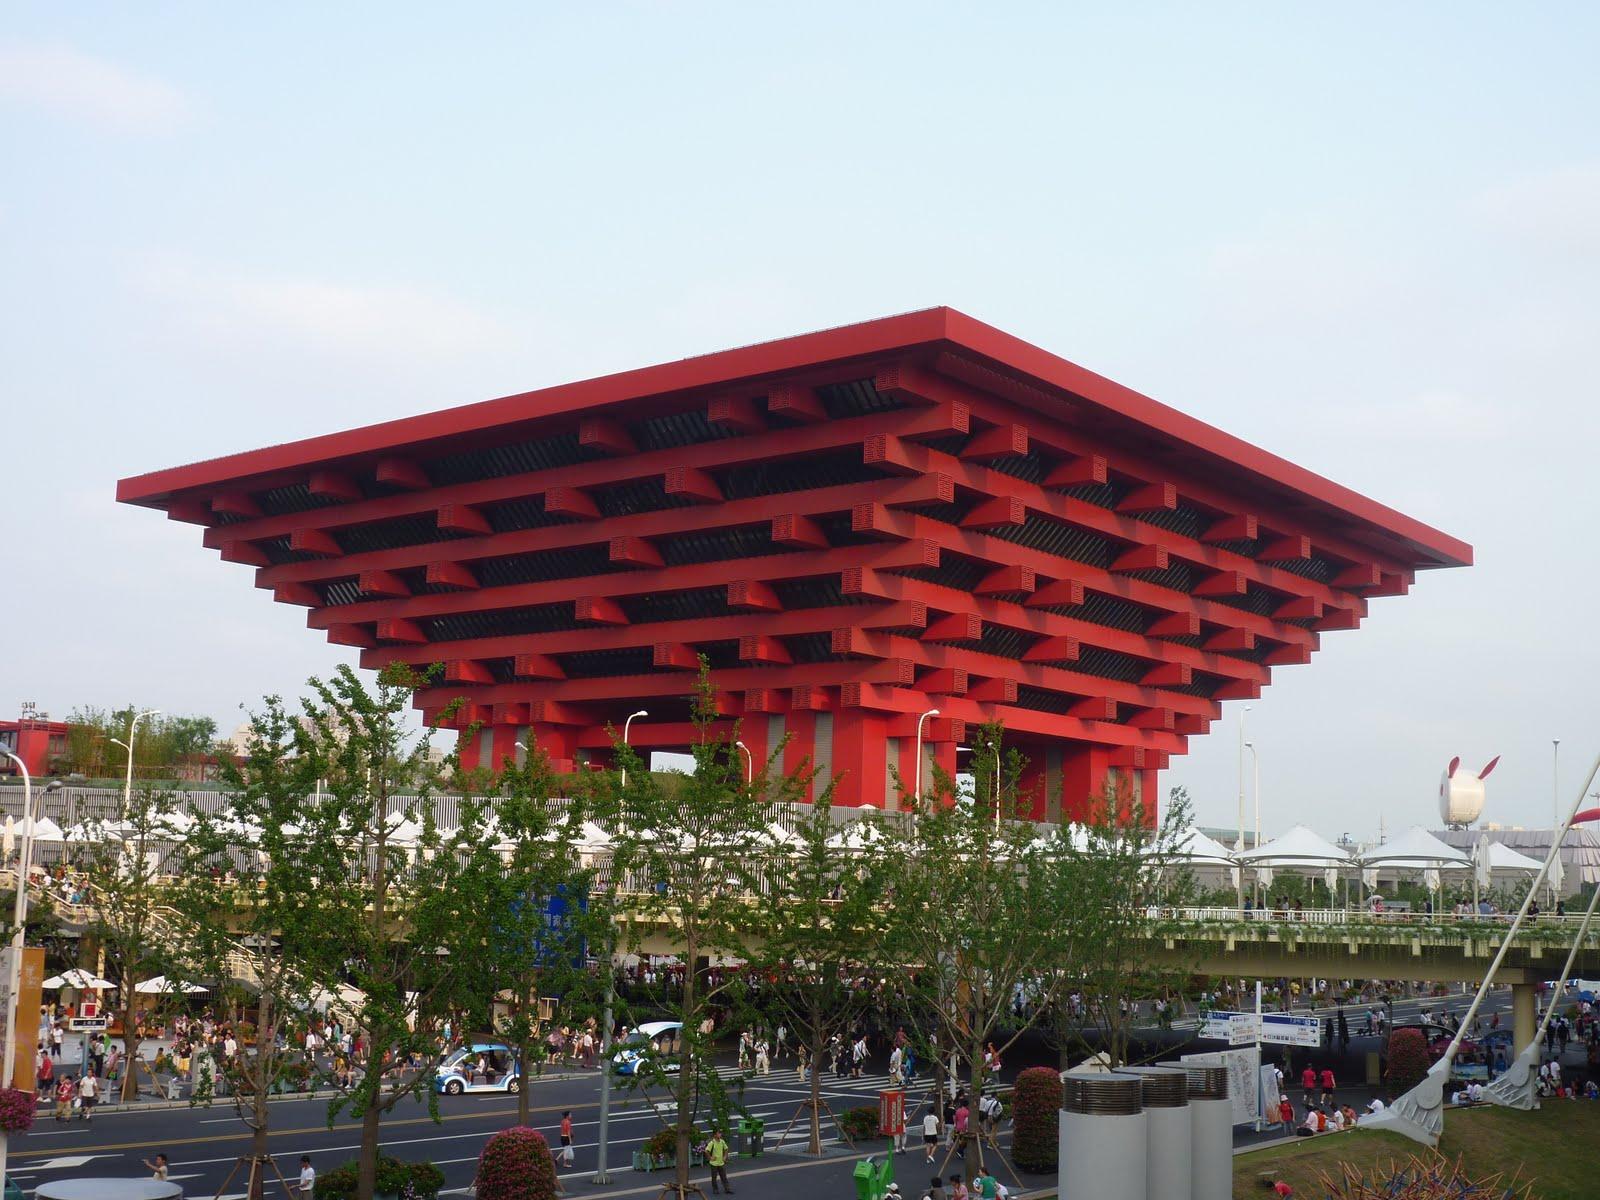 World expo 2010 shanghai china china pavilion at expo 2010 for Expo 2010 pavilions